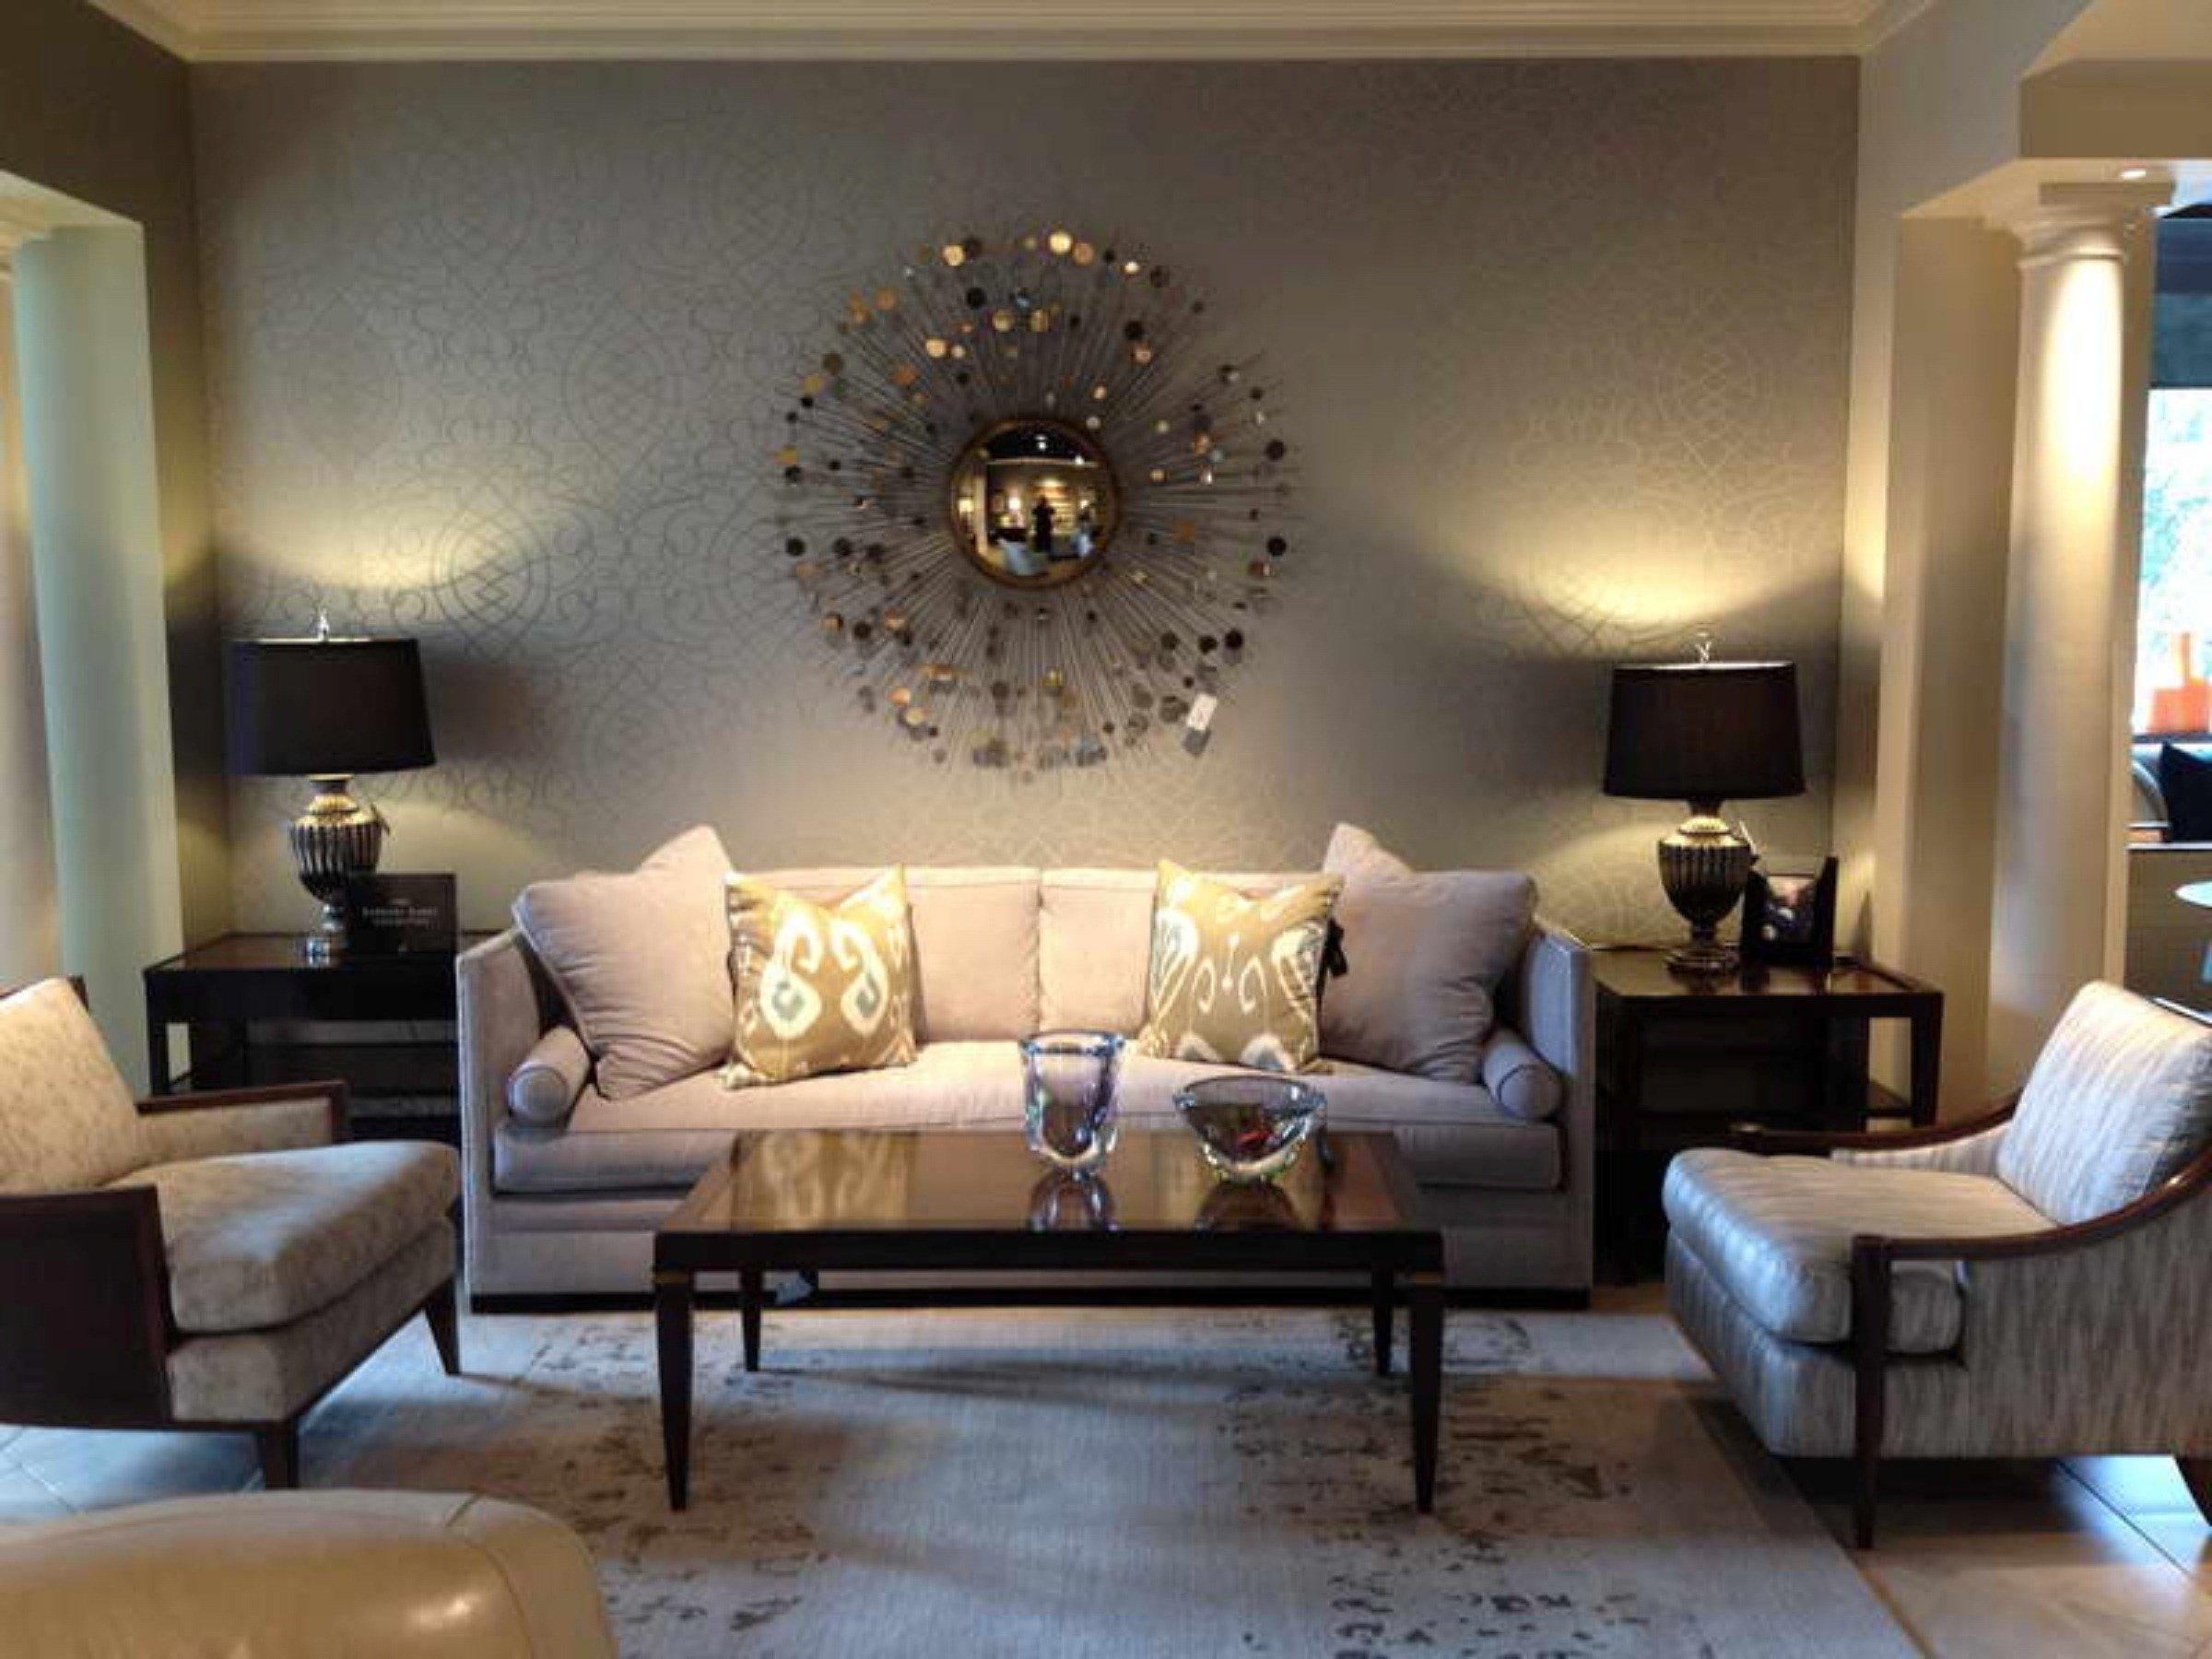 10 Beautiful Wall Art Ideas For Large Wall large living room wall art ideas e280a2 walls ideas 2020